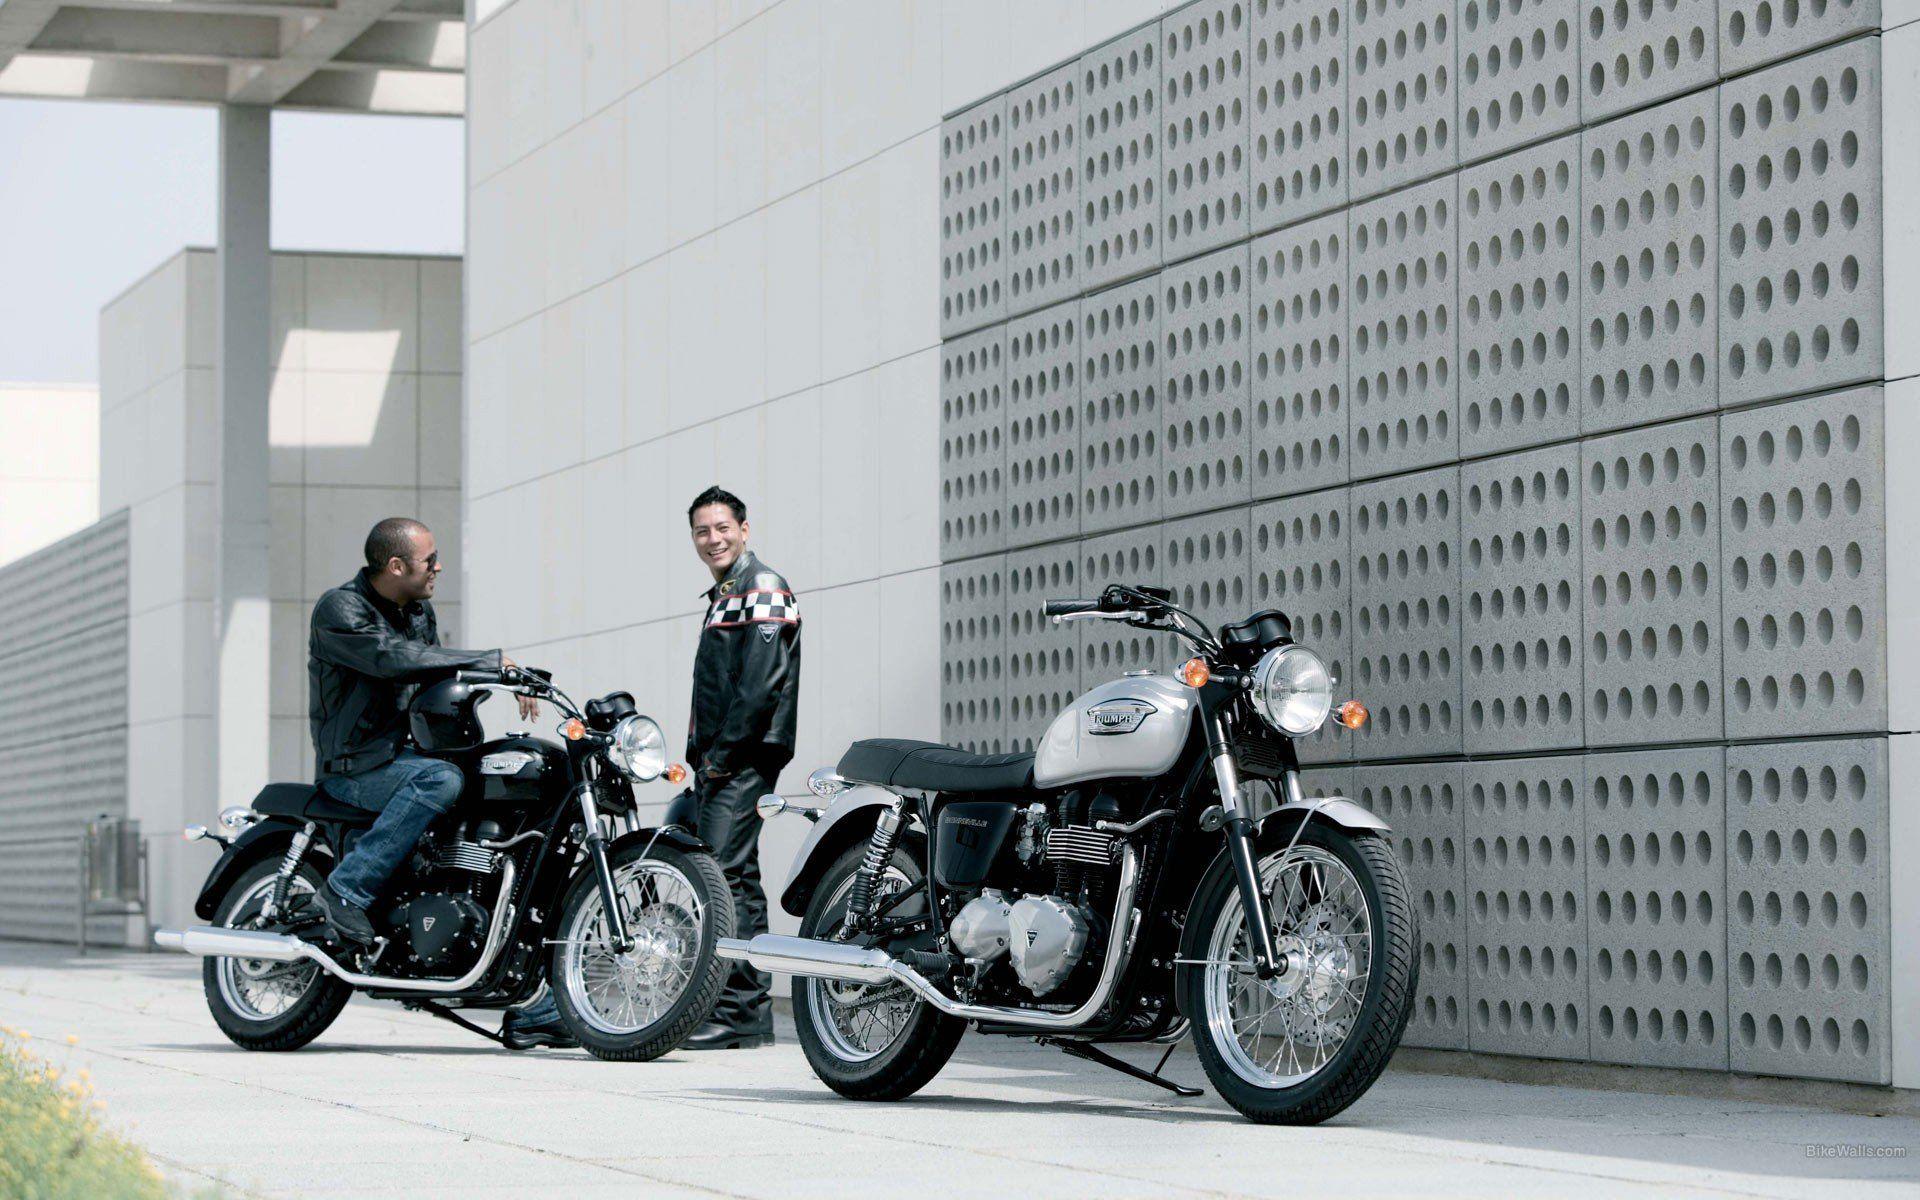 Triumph Thunderbird Bike Wallpaper Hd For Desktop Mboile 1024768